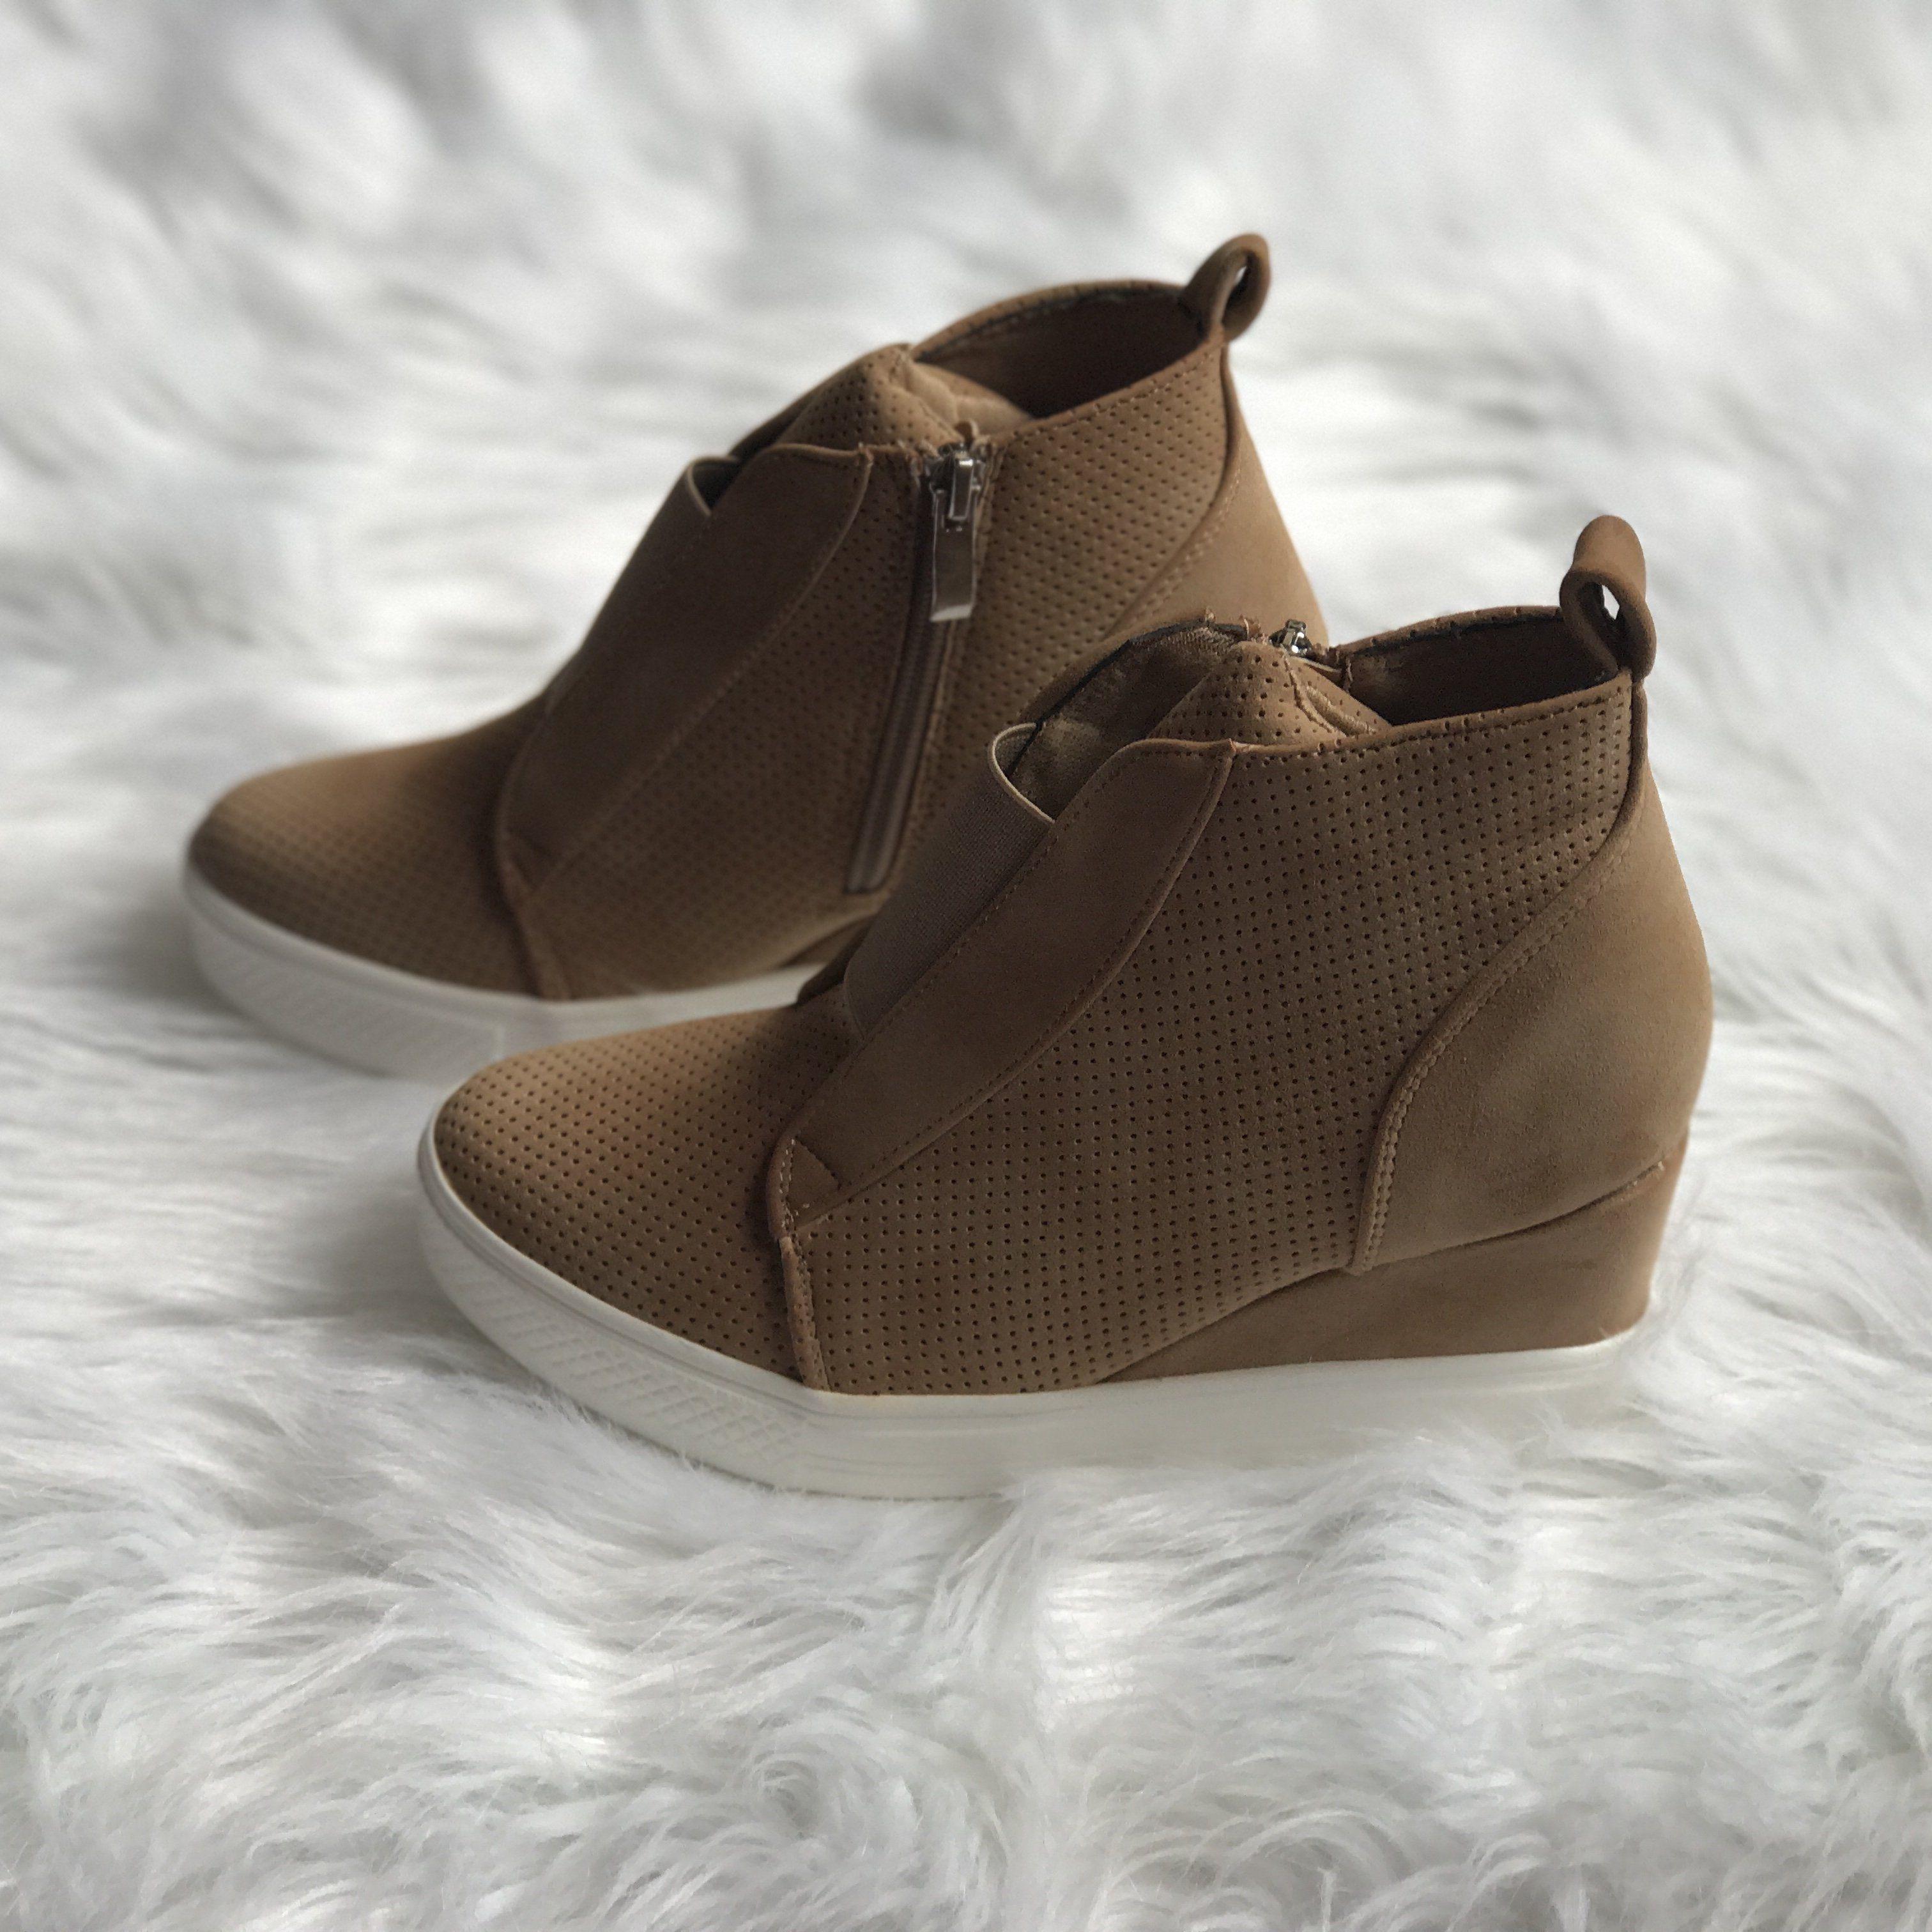 6cf34b1f8572 Ccocci Zoey Wedge Sneaker - Camel